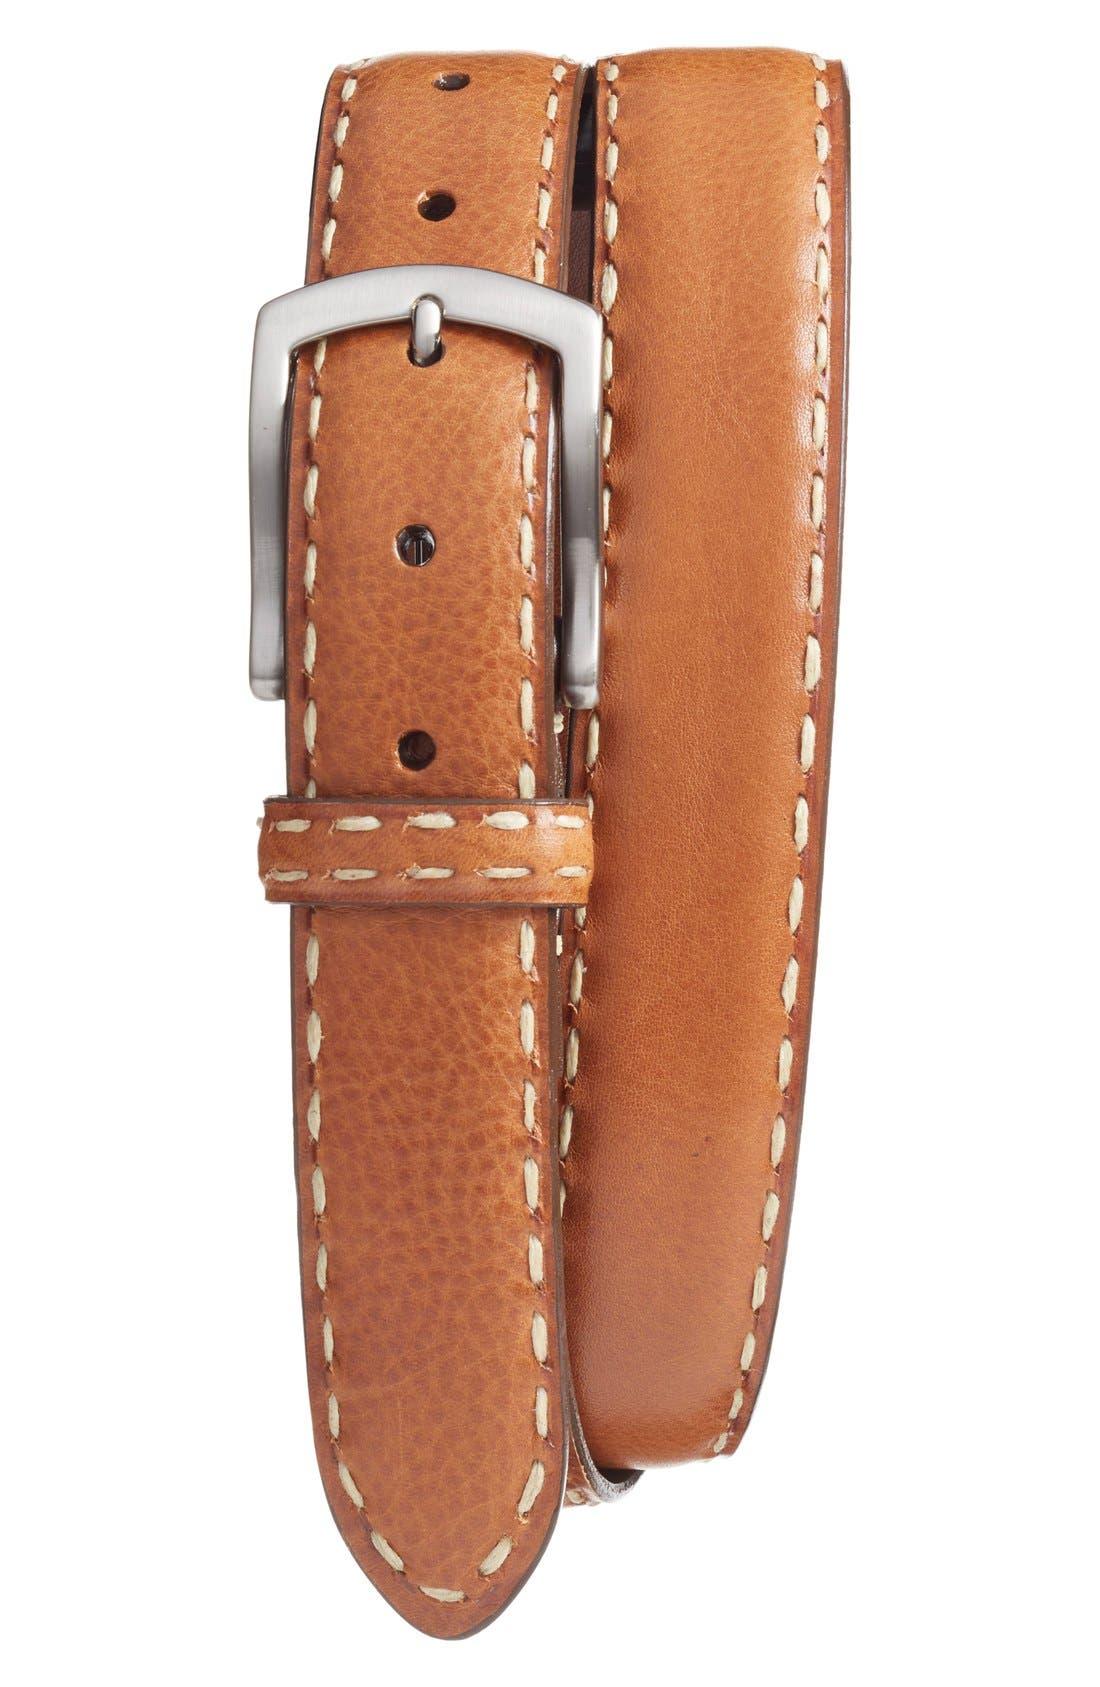 Alternate Image 1 Selected - Torino Belts Calfskin Leather Belt